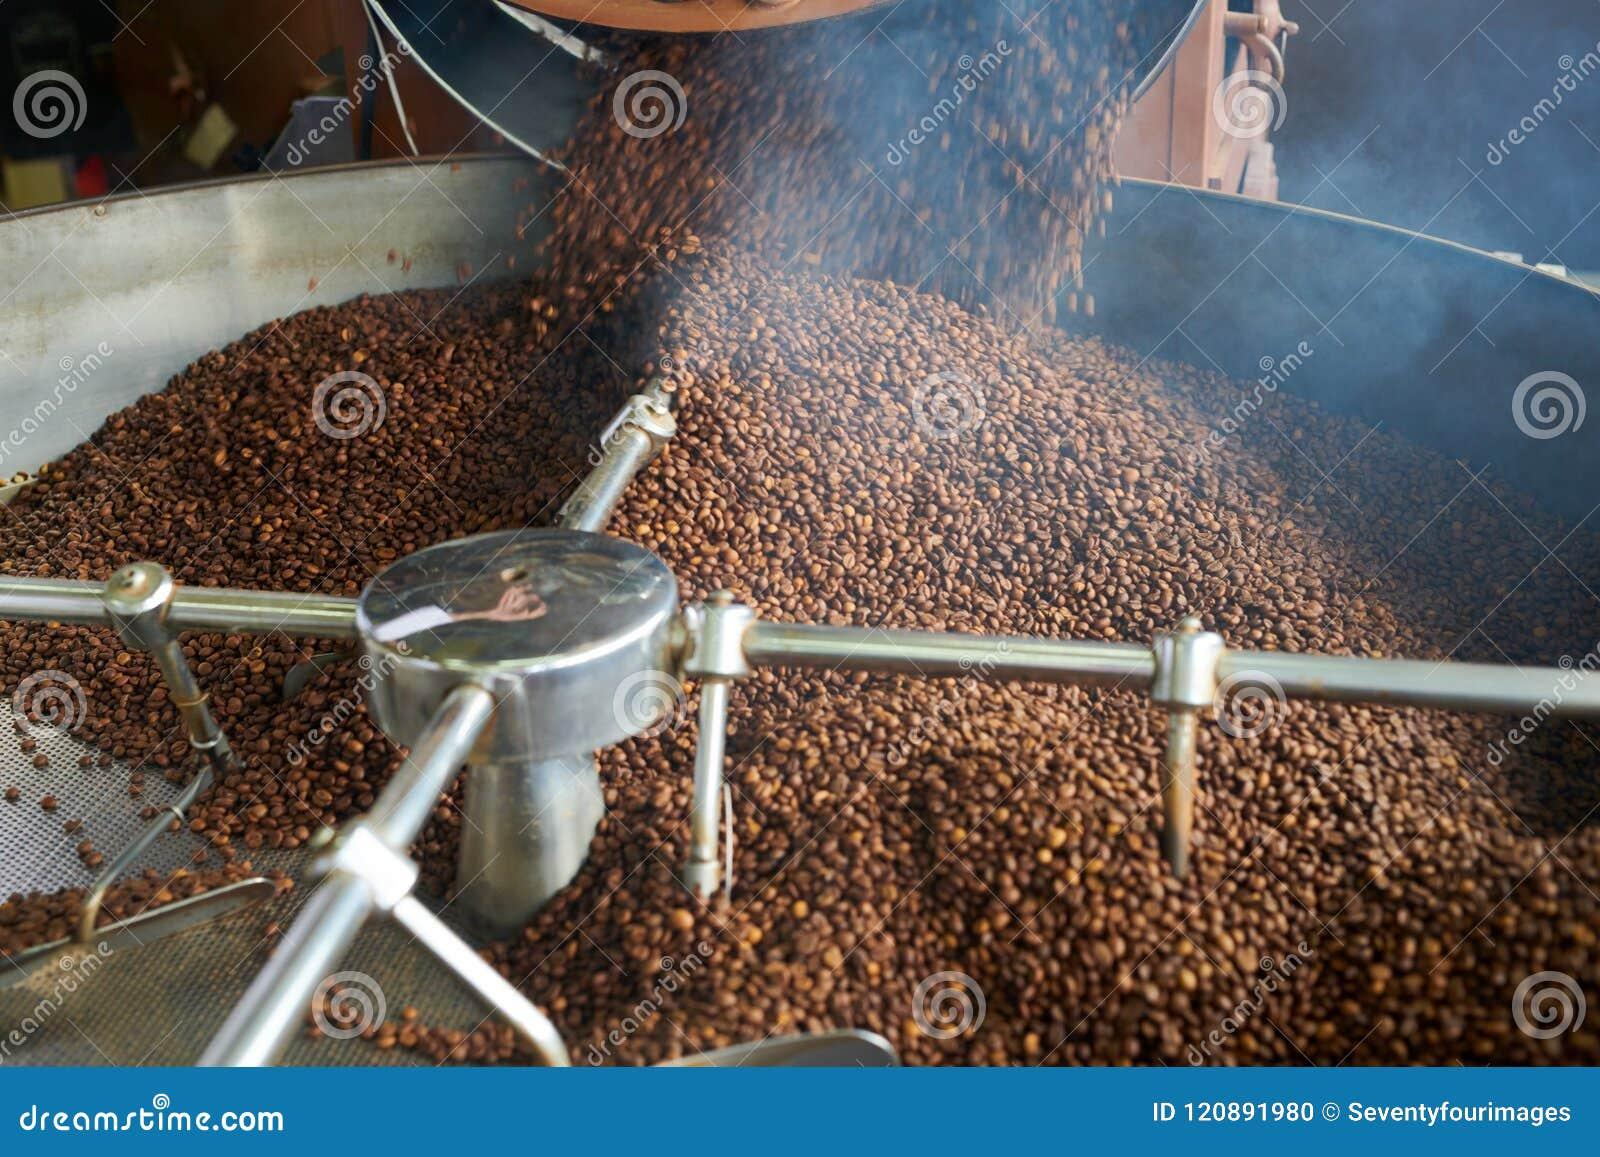 Smoking Coffee Beans Roasting In Machine Stock Photo - Image